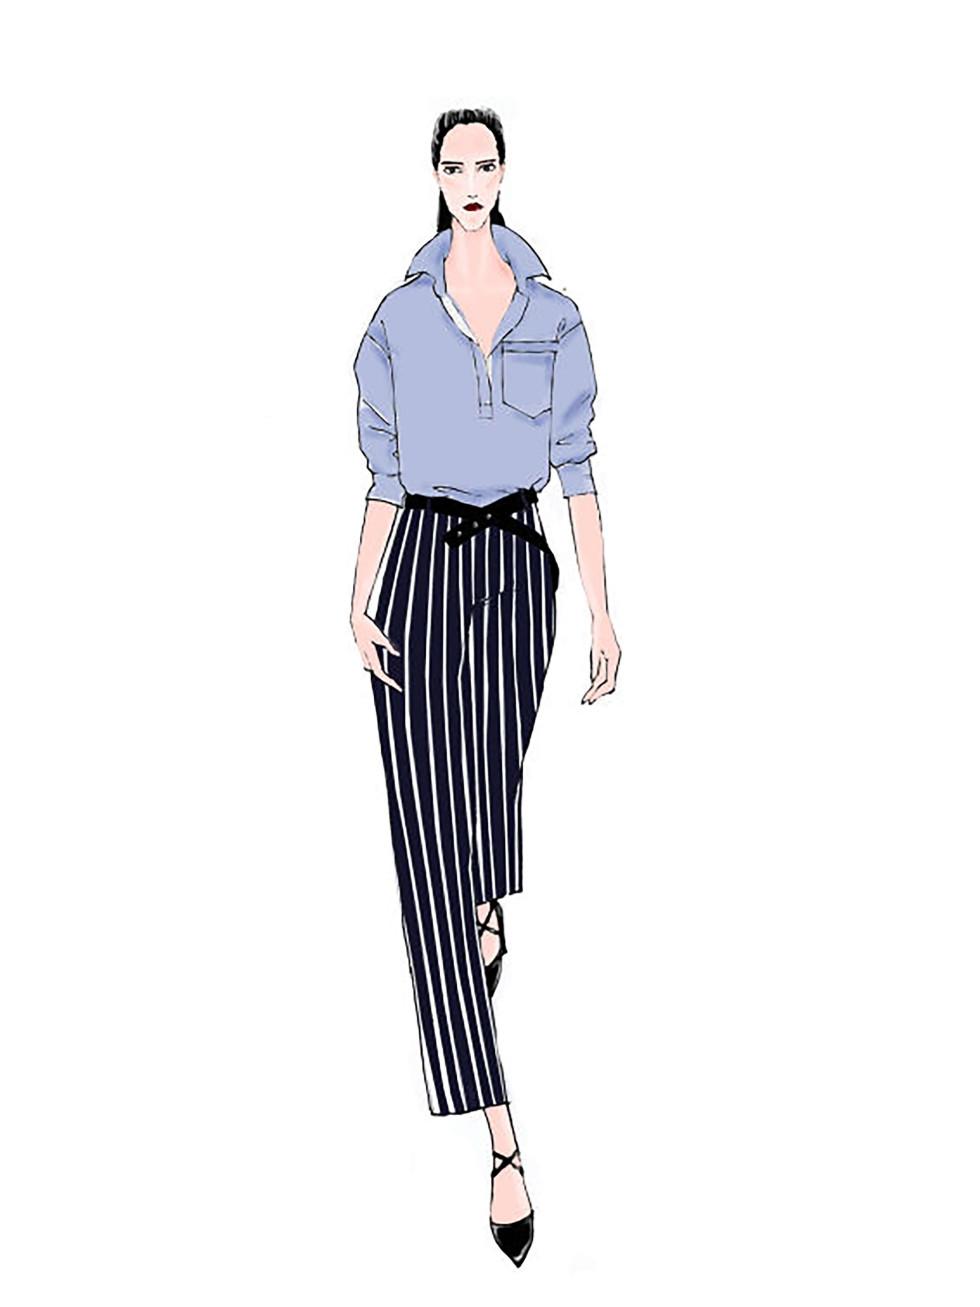 Taoray Wang designer inspiration sketch spring 2017